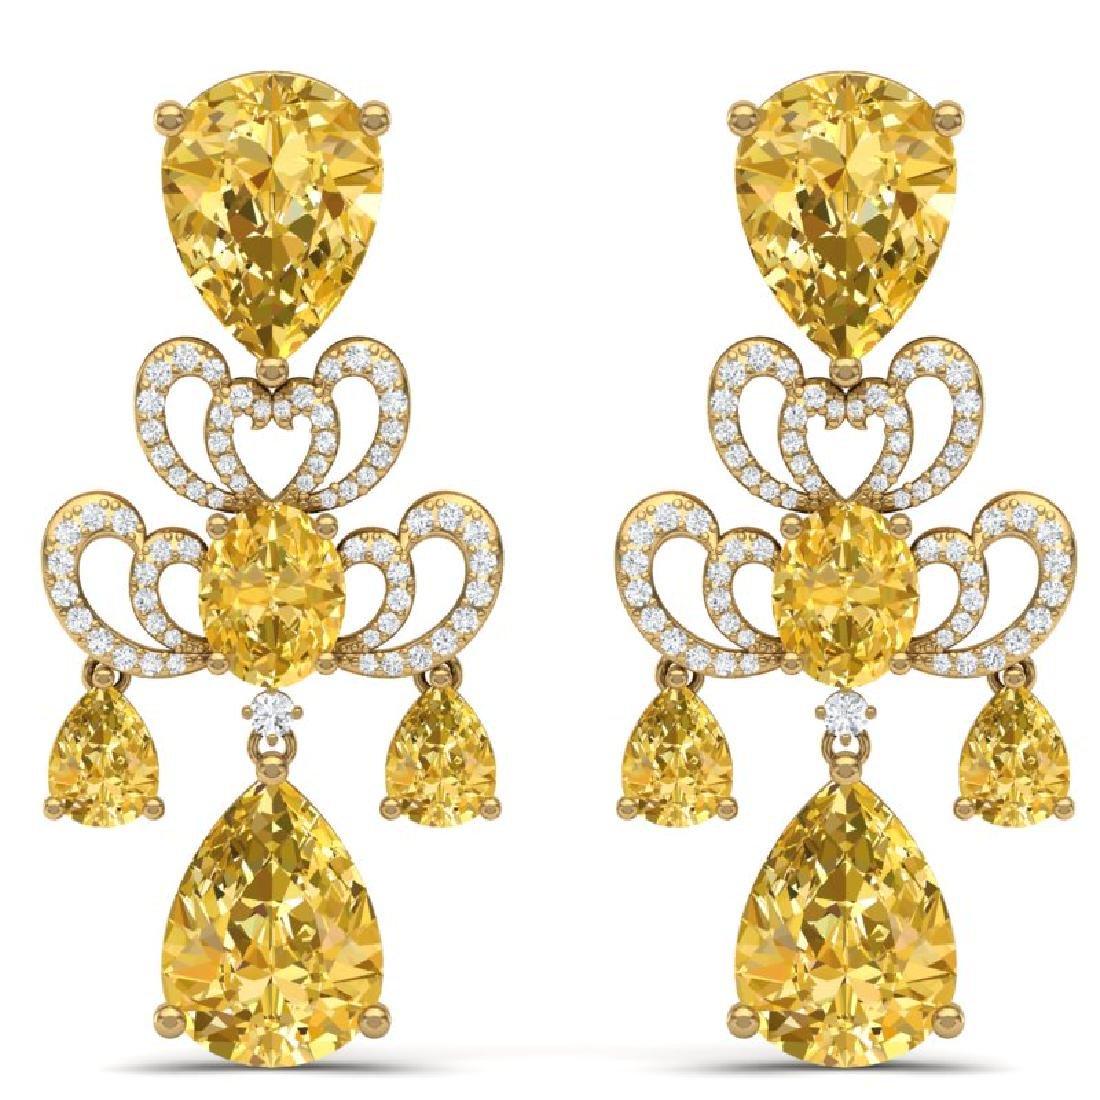 55.89 CTW Royalty Canary Citrine & VS Diamond Earrings